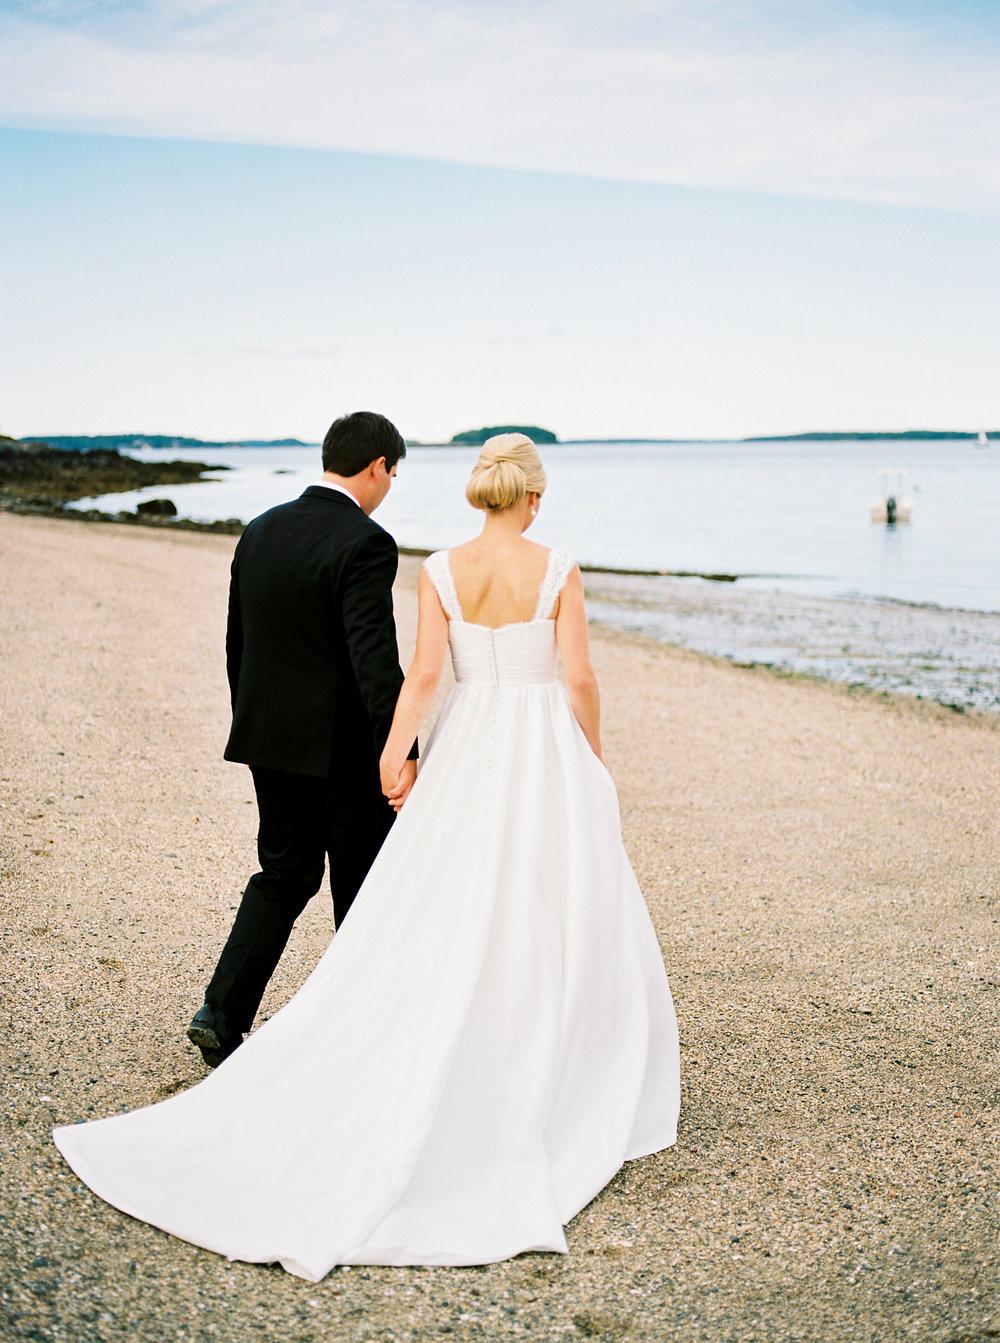 Alexandra-Elise-Photography-Ali-Reed-Chebeague-Island-Maine-Film-Wedding-Photographer-Elizabeth-Josh-Highlights-031.jpg